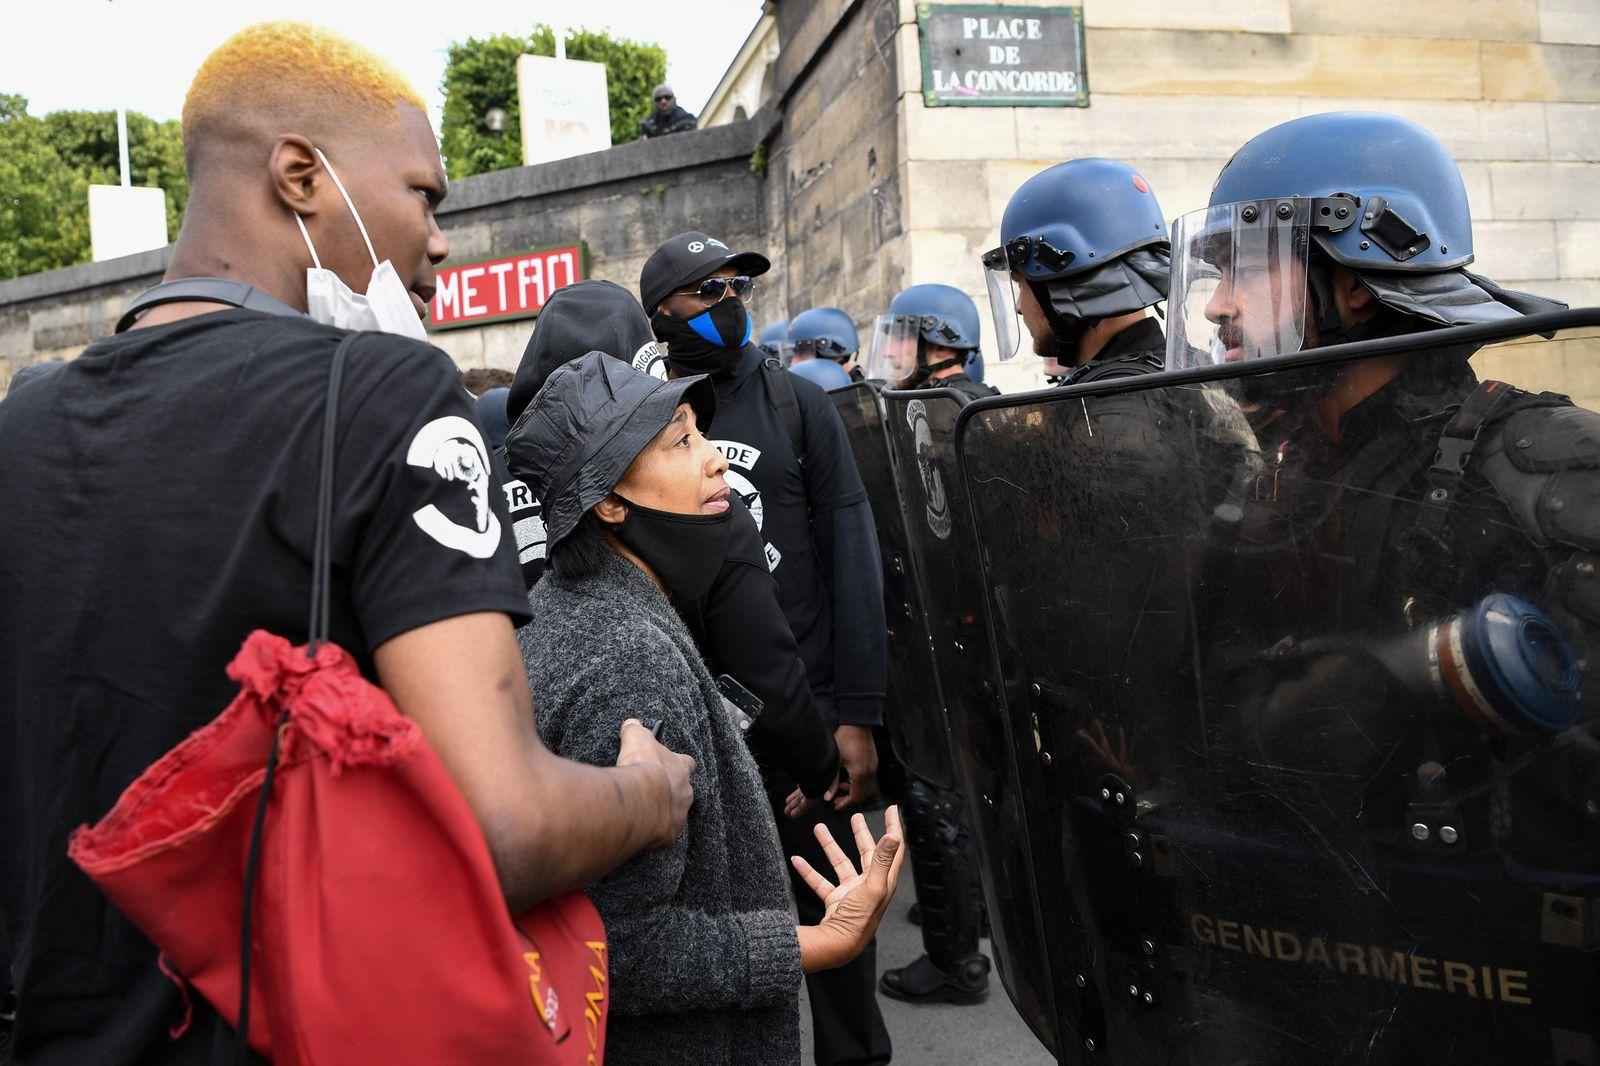 FRANCE-US-RACISM-PROTEST